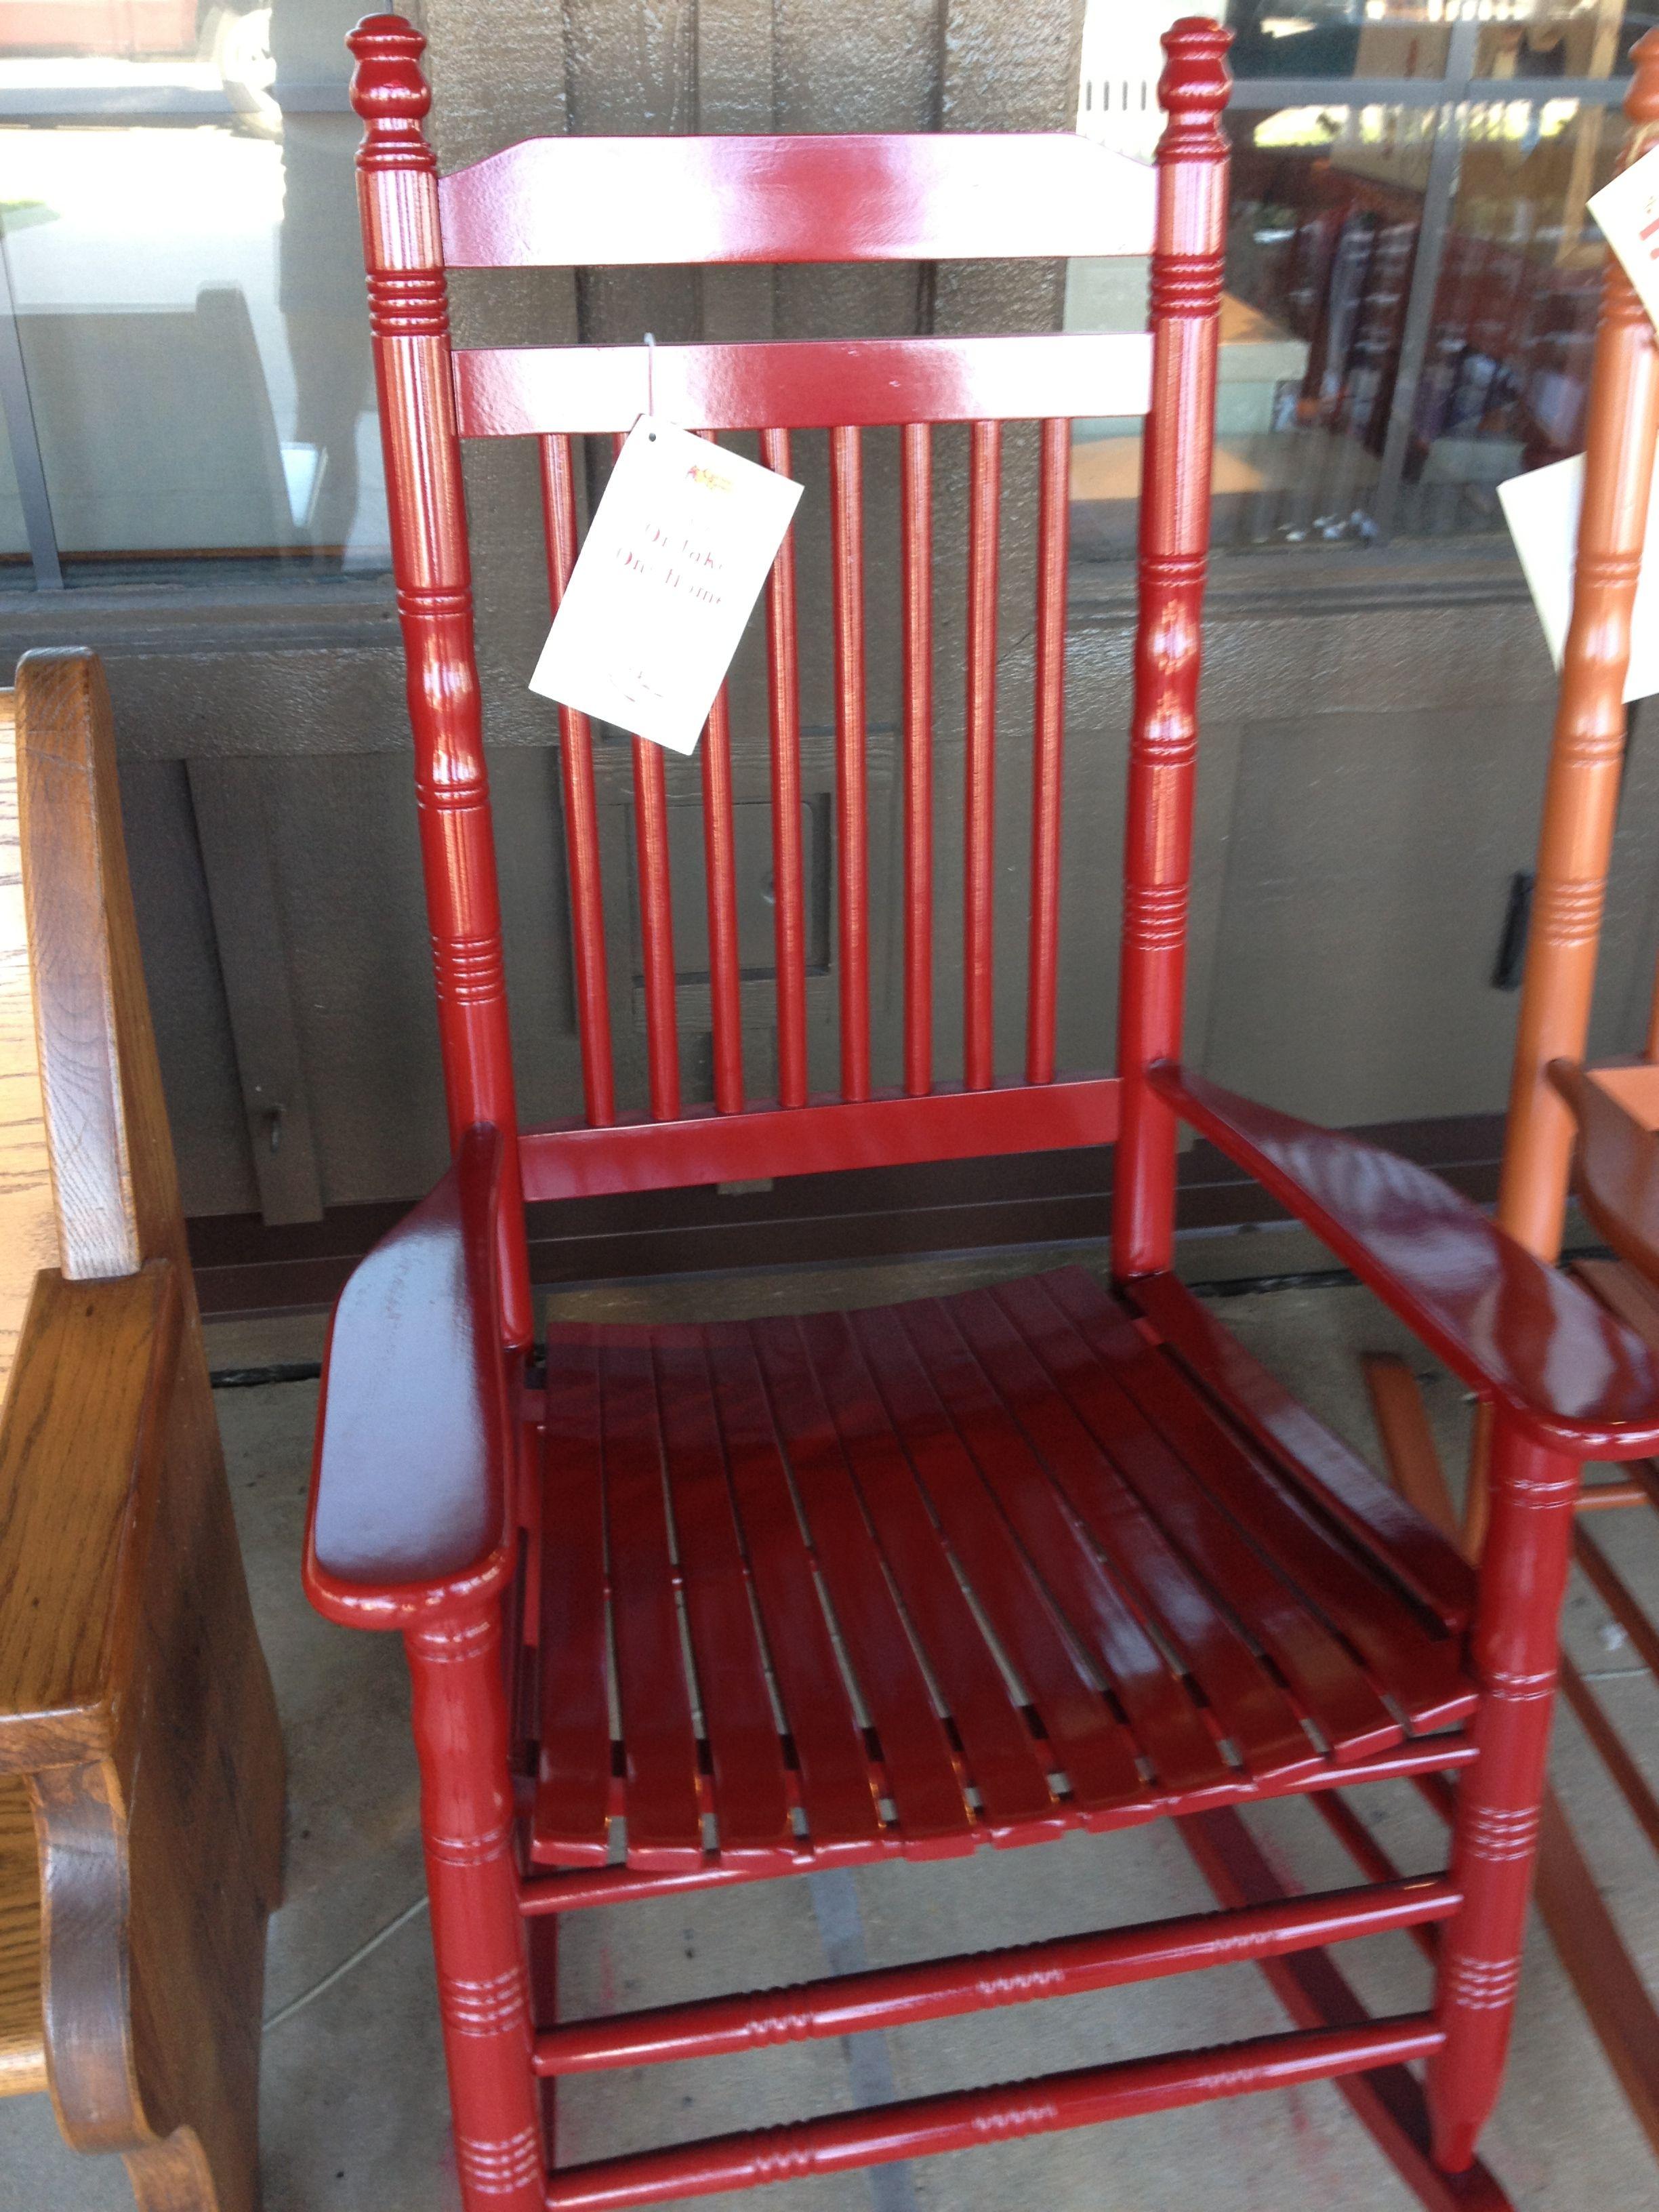 Red Rocking Chair From Cracker Barrel Cracker Barrel Rocking Chair Rocking Chair Cushions Rocking Chair Cushion